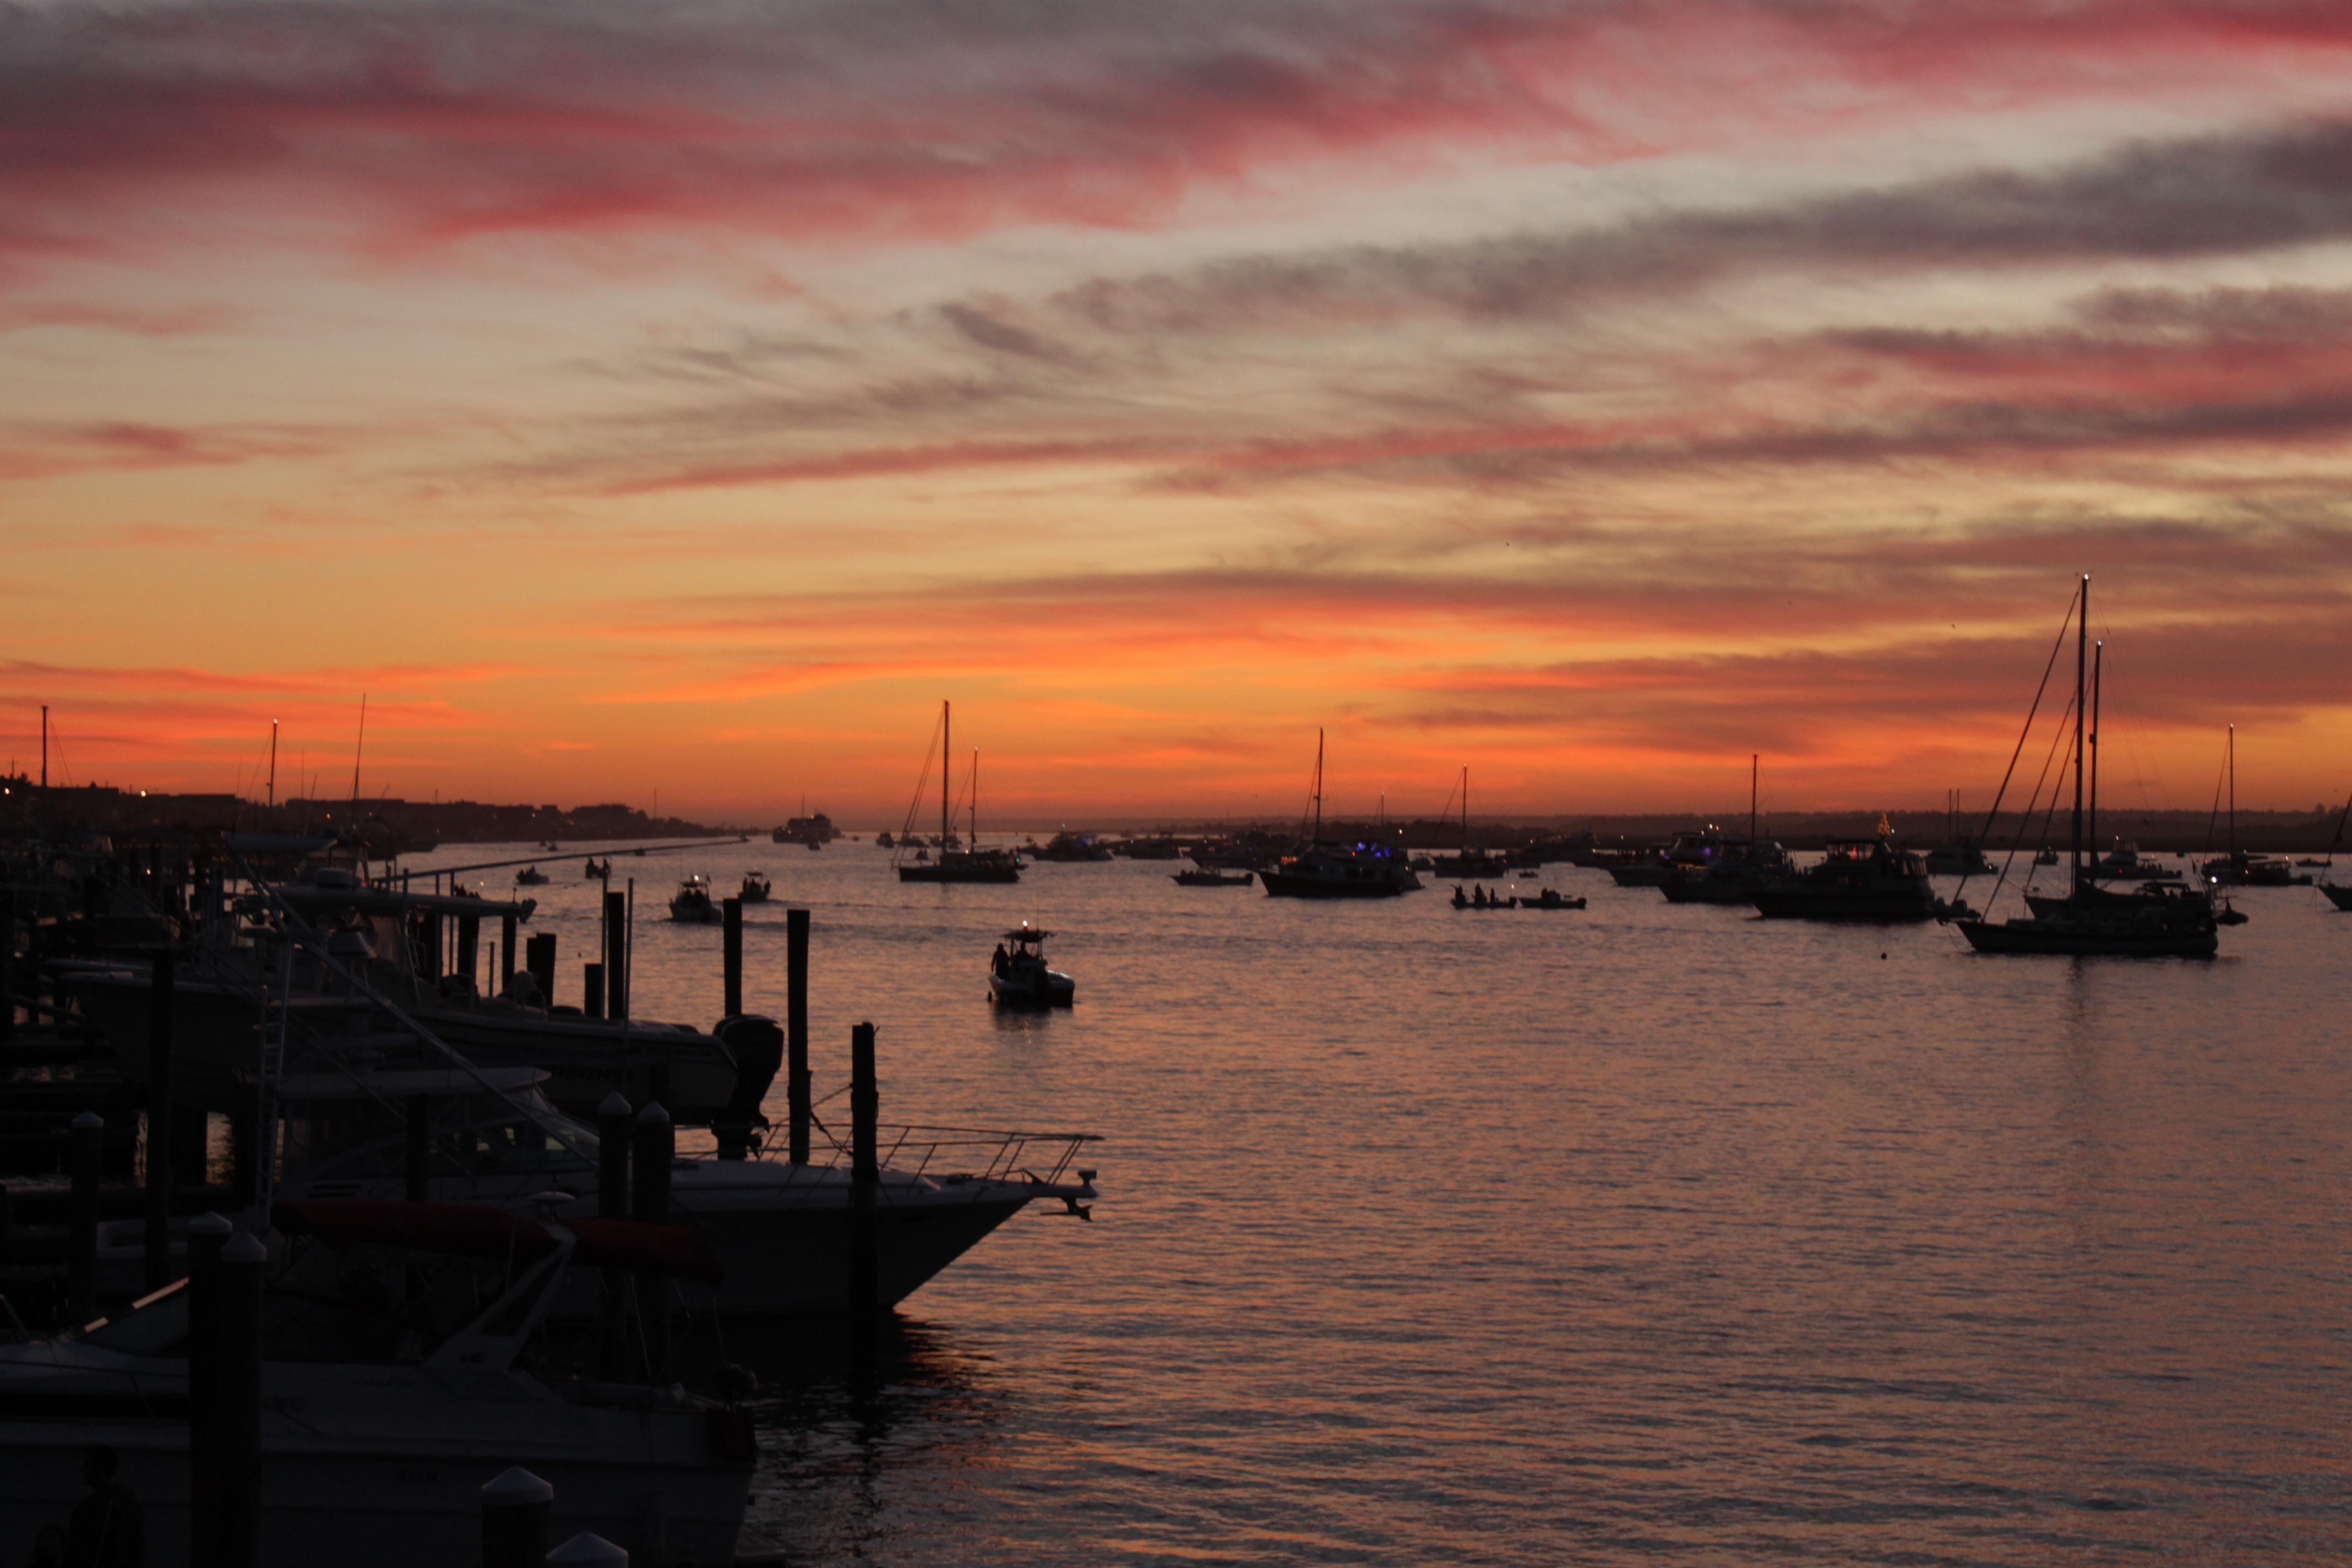 WB sunset 1